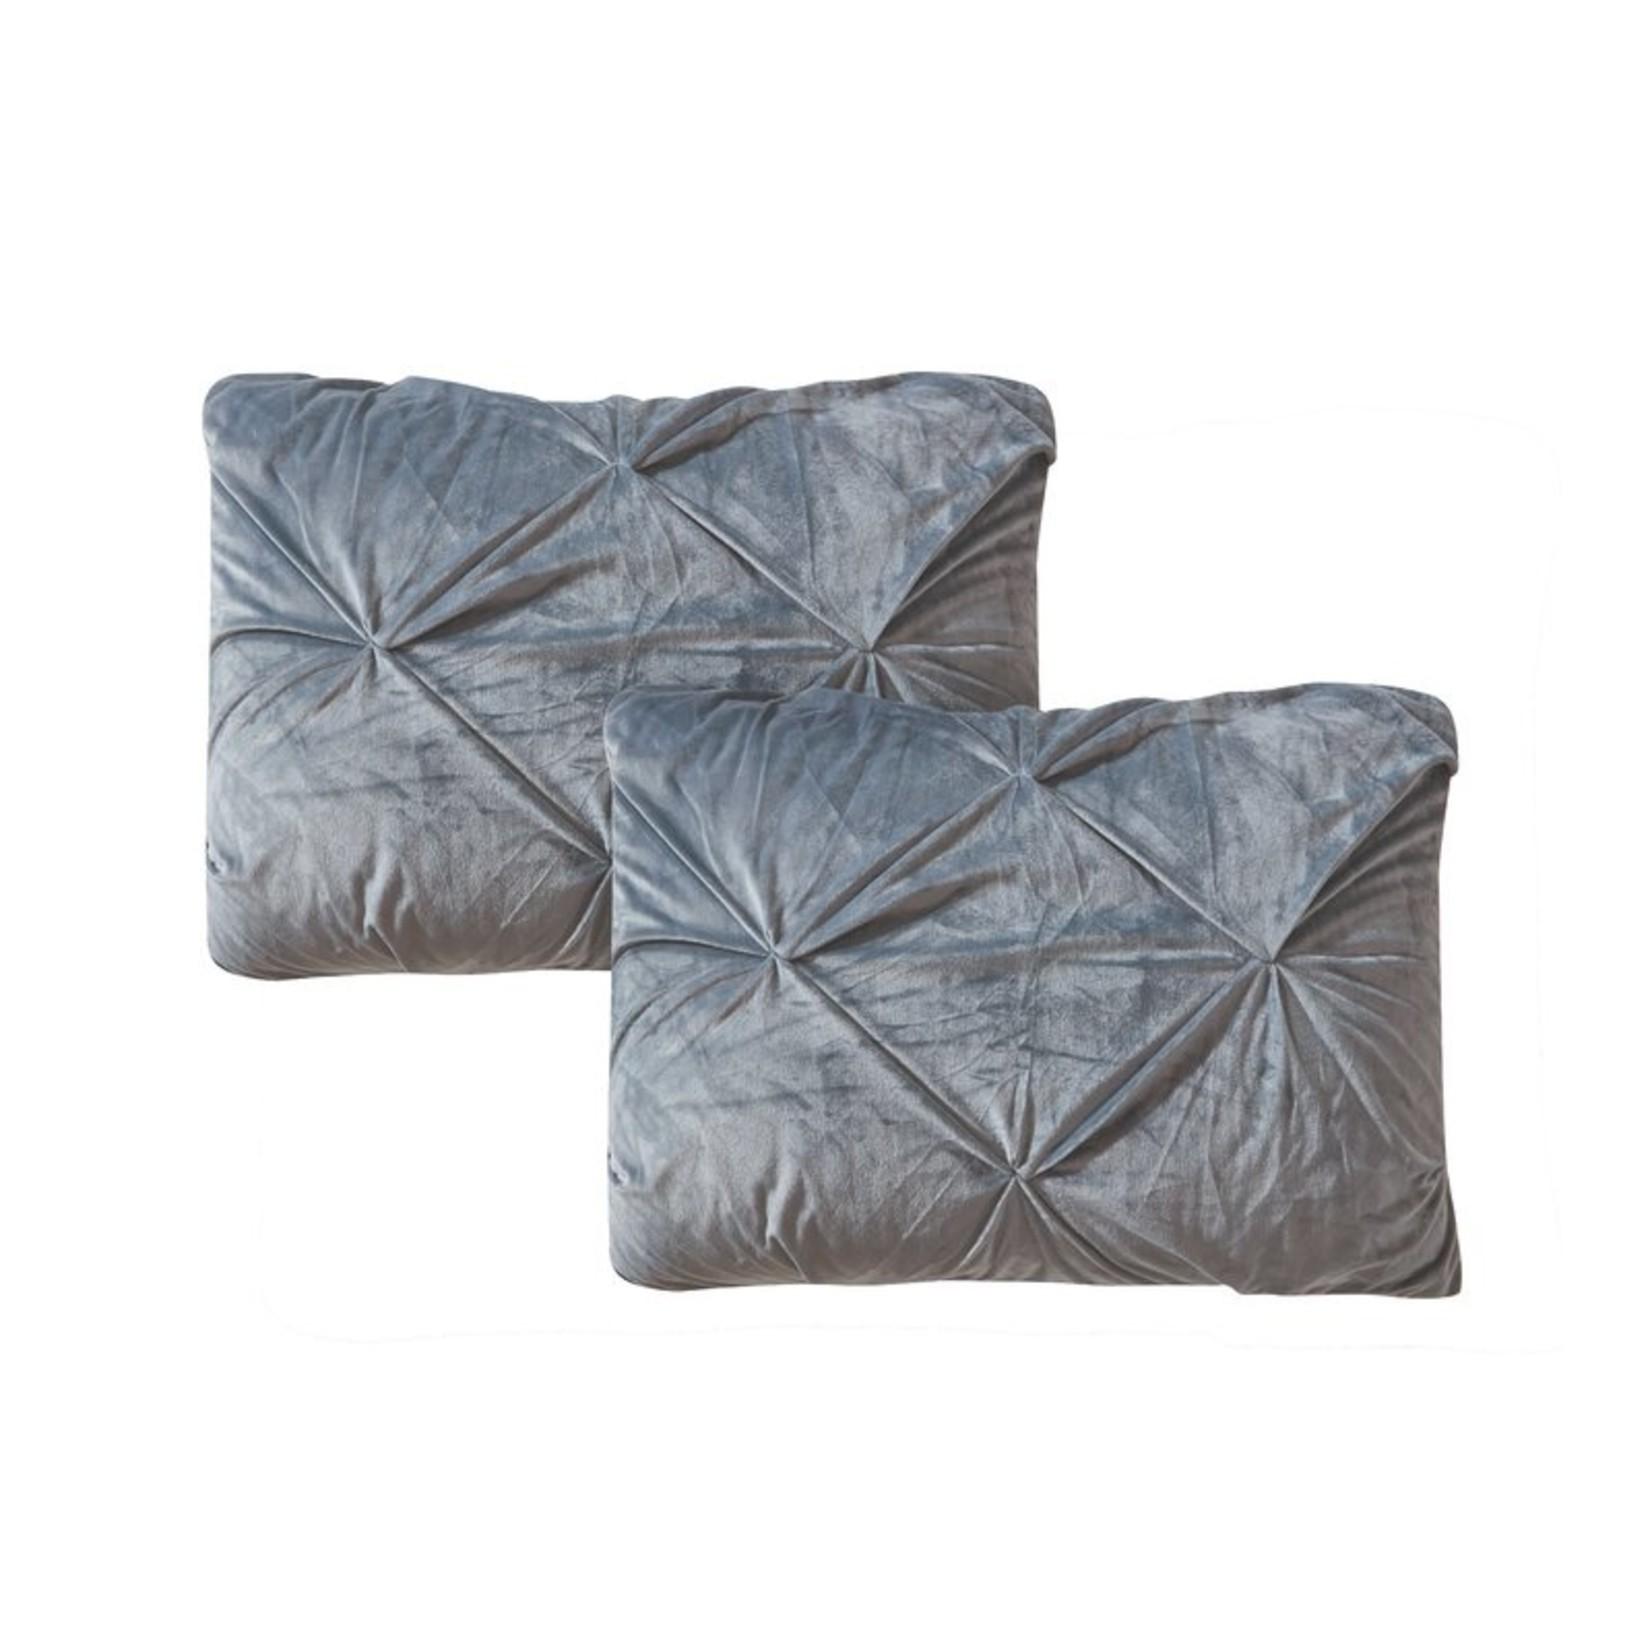 *Dinan Velvet Pintuck Sherpa Reversible Comforter Set - King - FINAL SALE